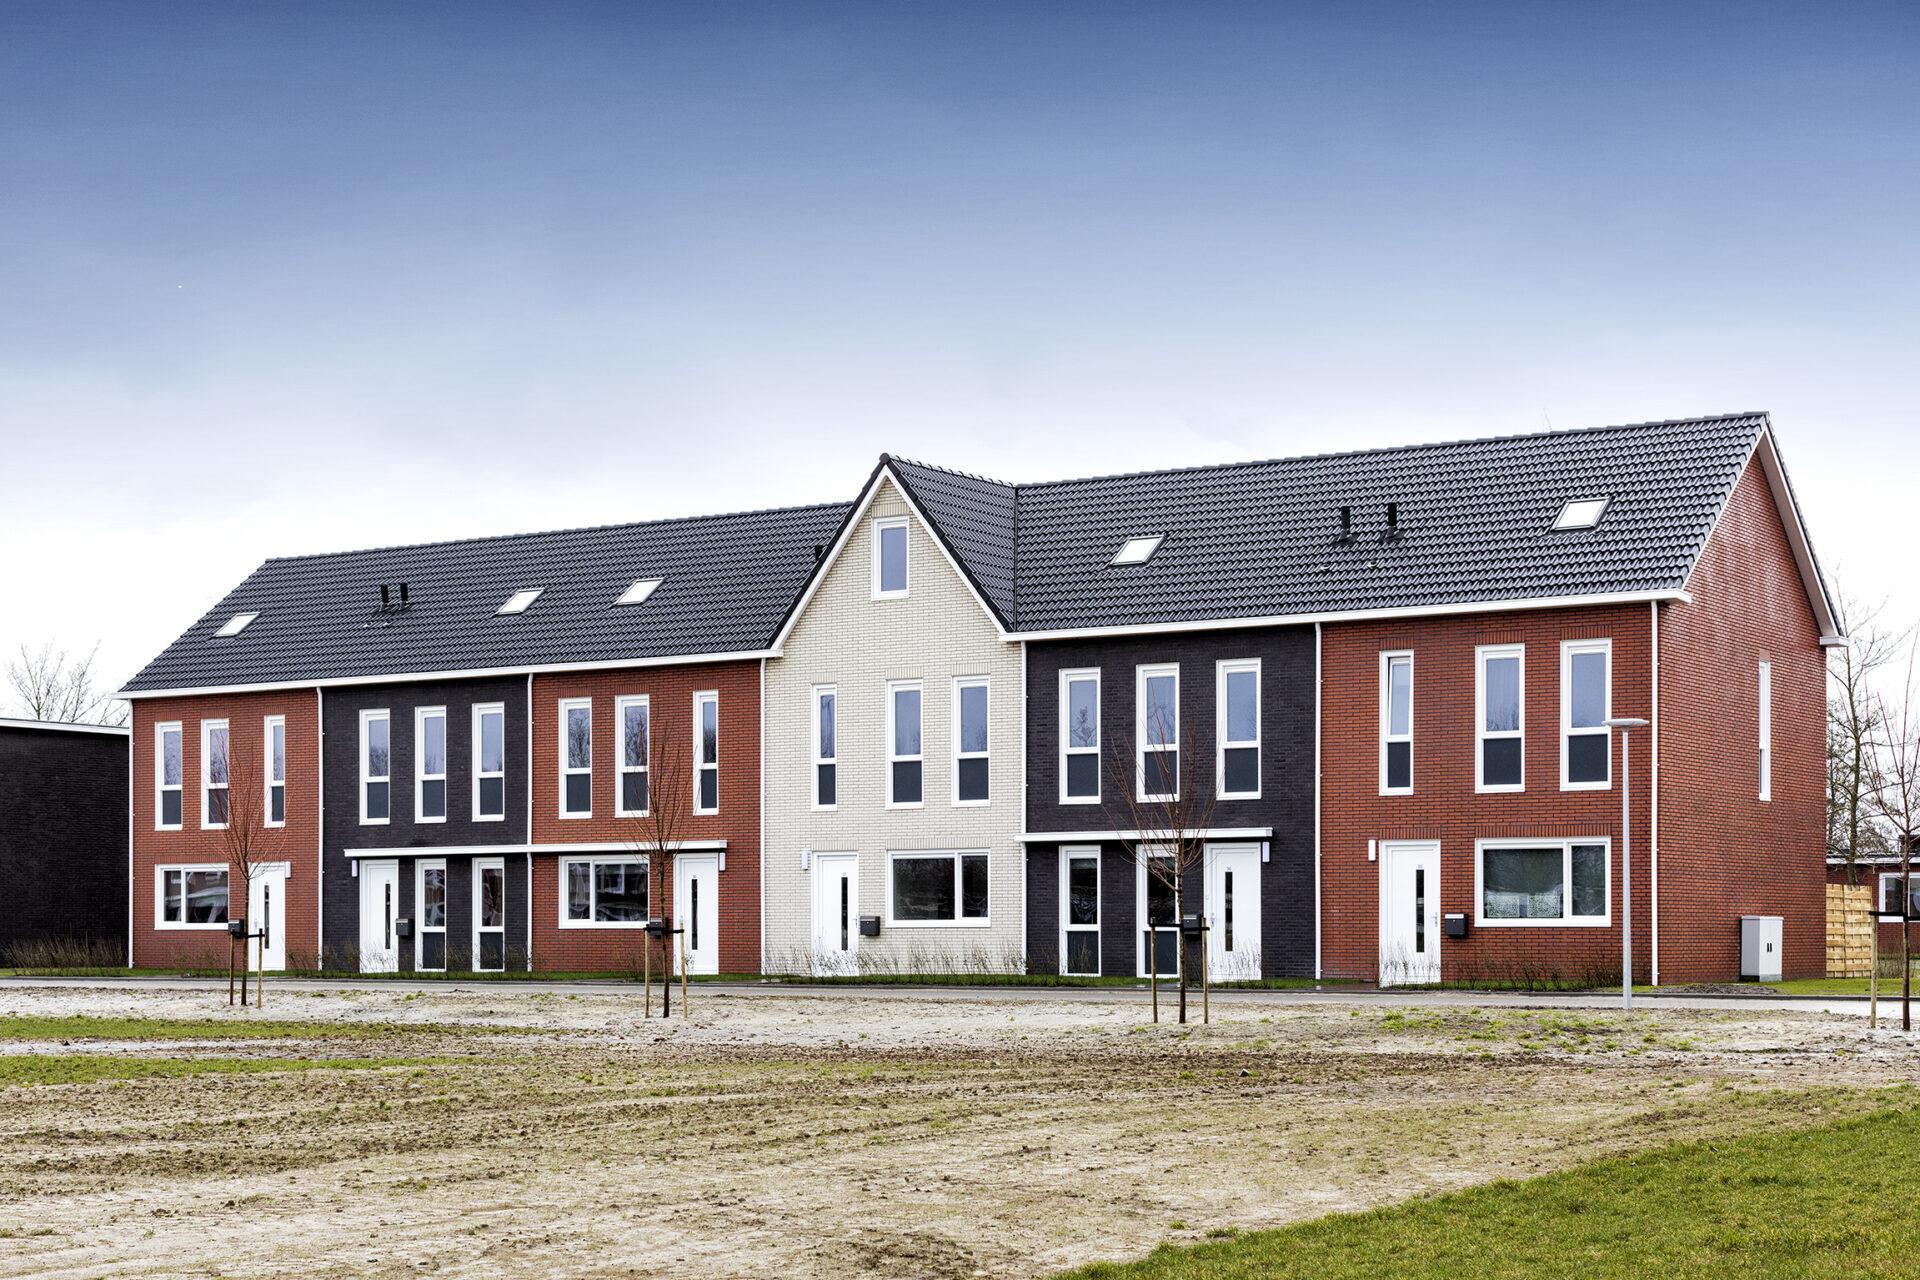 Wisselwoningen in Appingedam